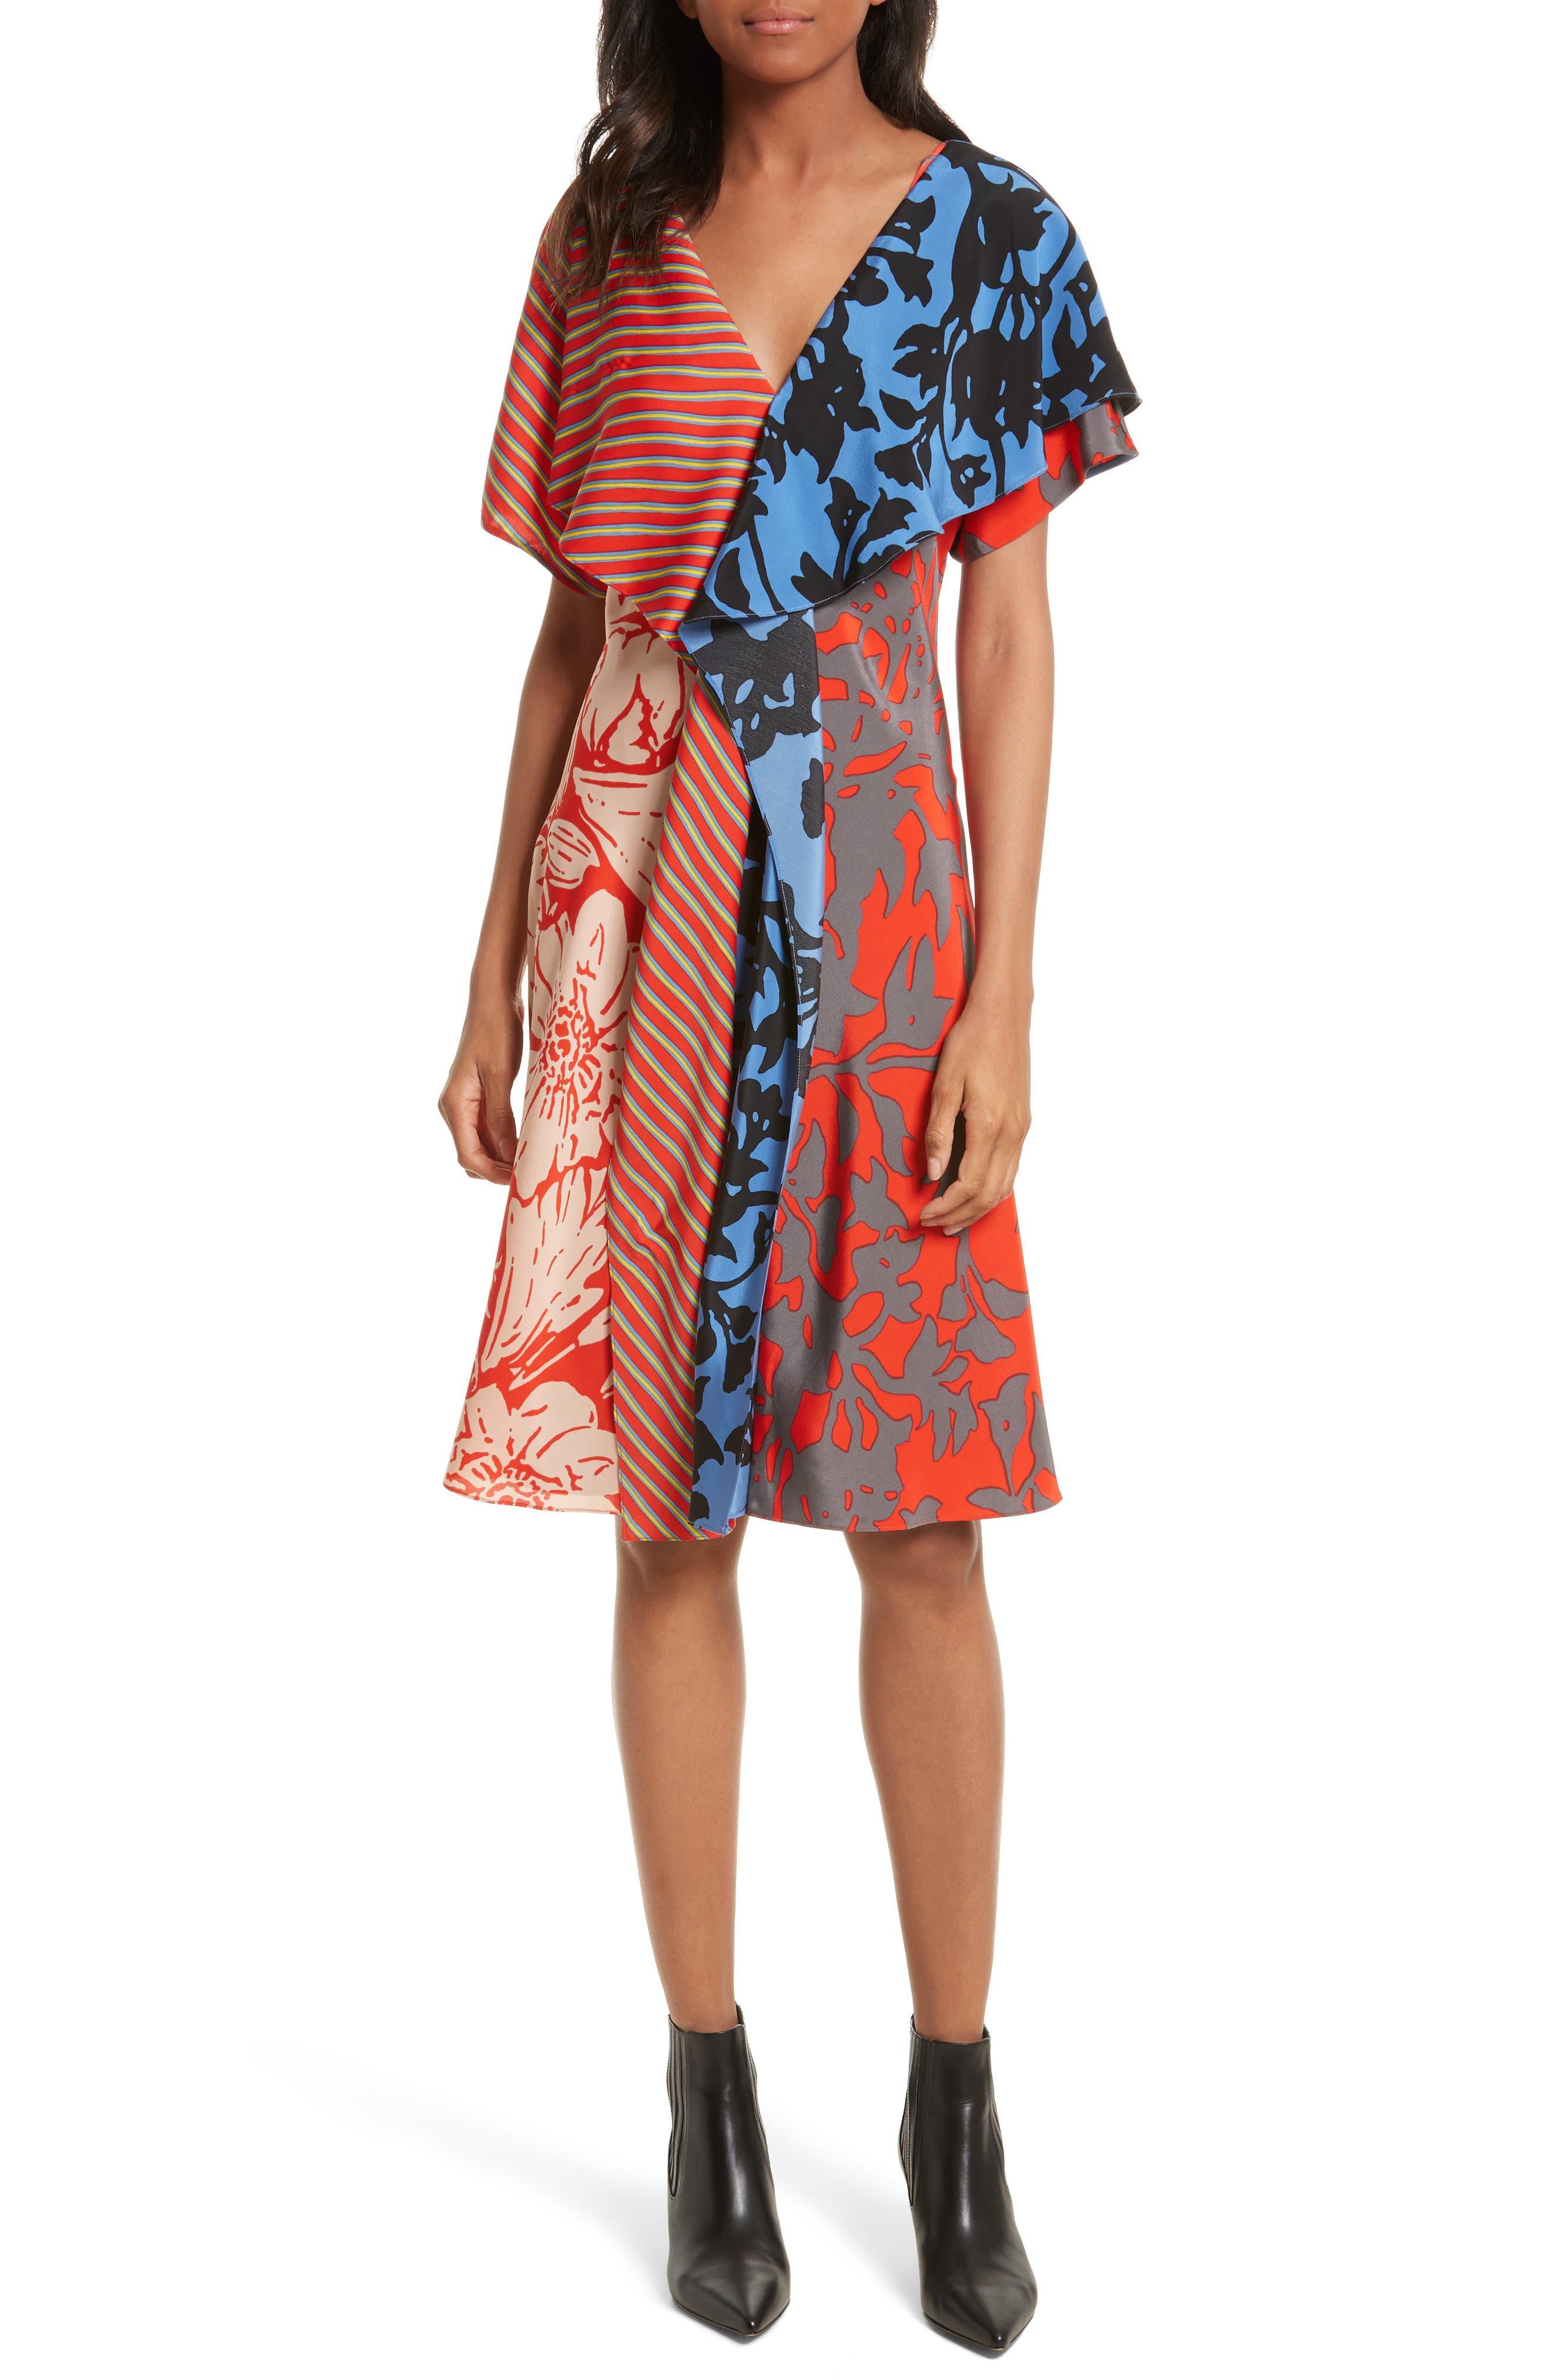 Alternate Image 1 Selected - Diane von Furstenberg Mix Print Silk Ruffle Dress